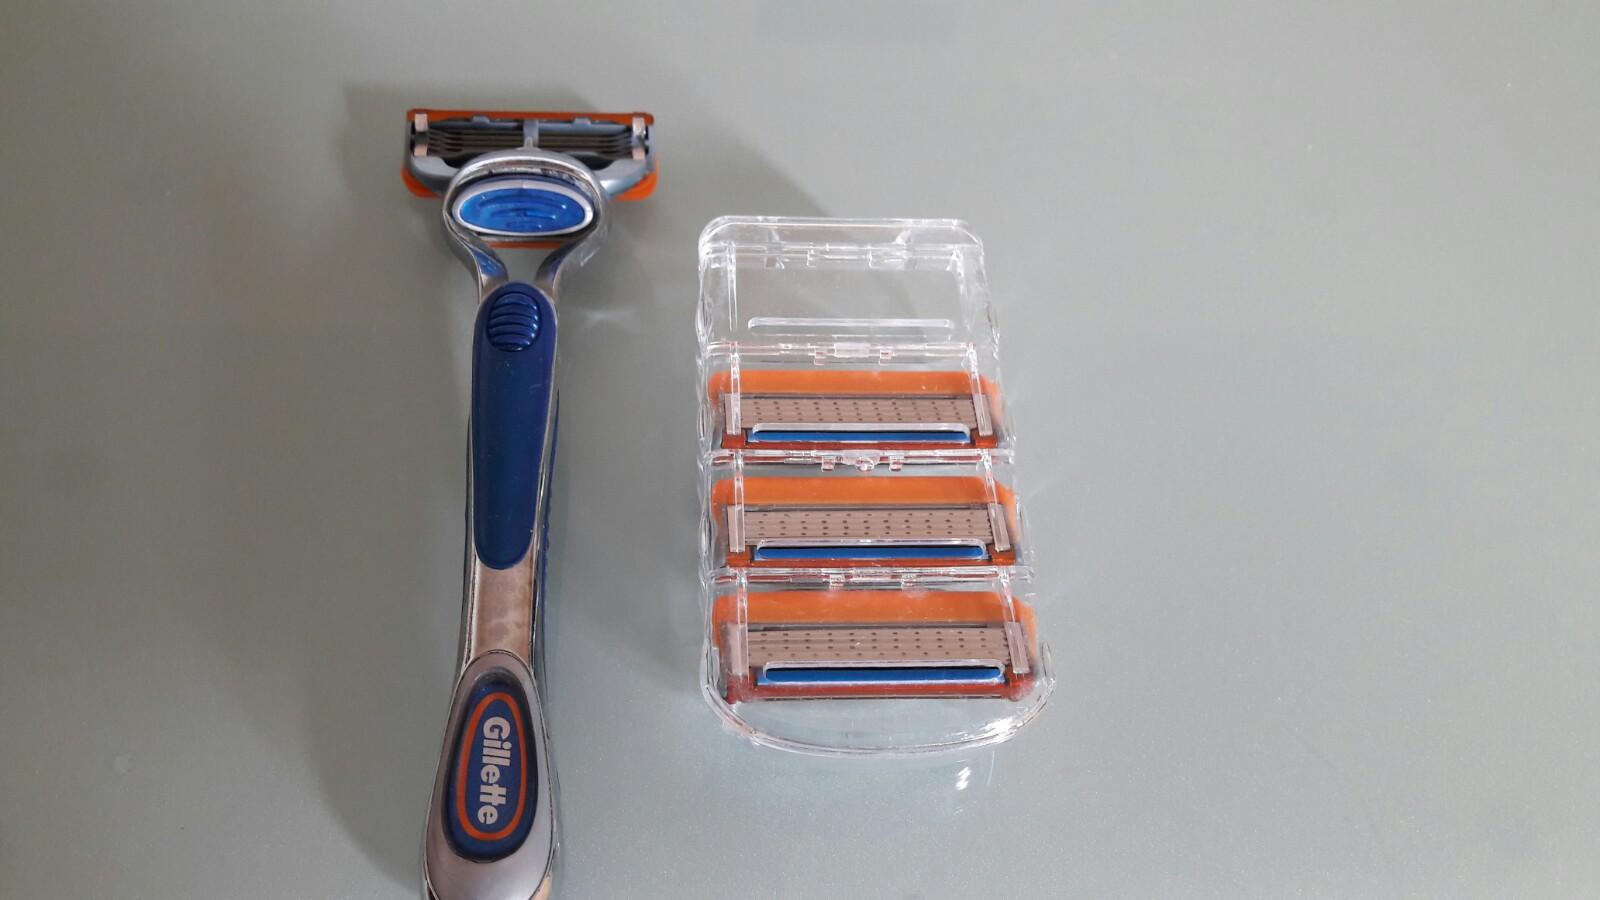 Pack 4 uds hojas cortadores cuchillas de afeitar de reemplazo Enova para  máquinas de Gillette modelos Fusion 1db8dd116e6f